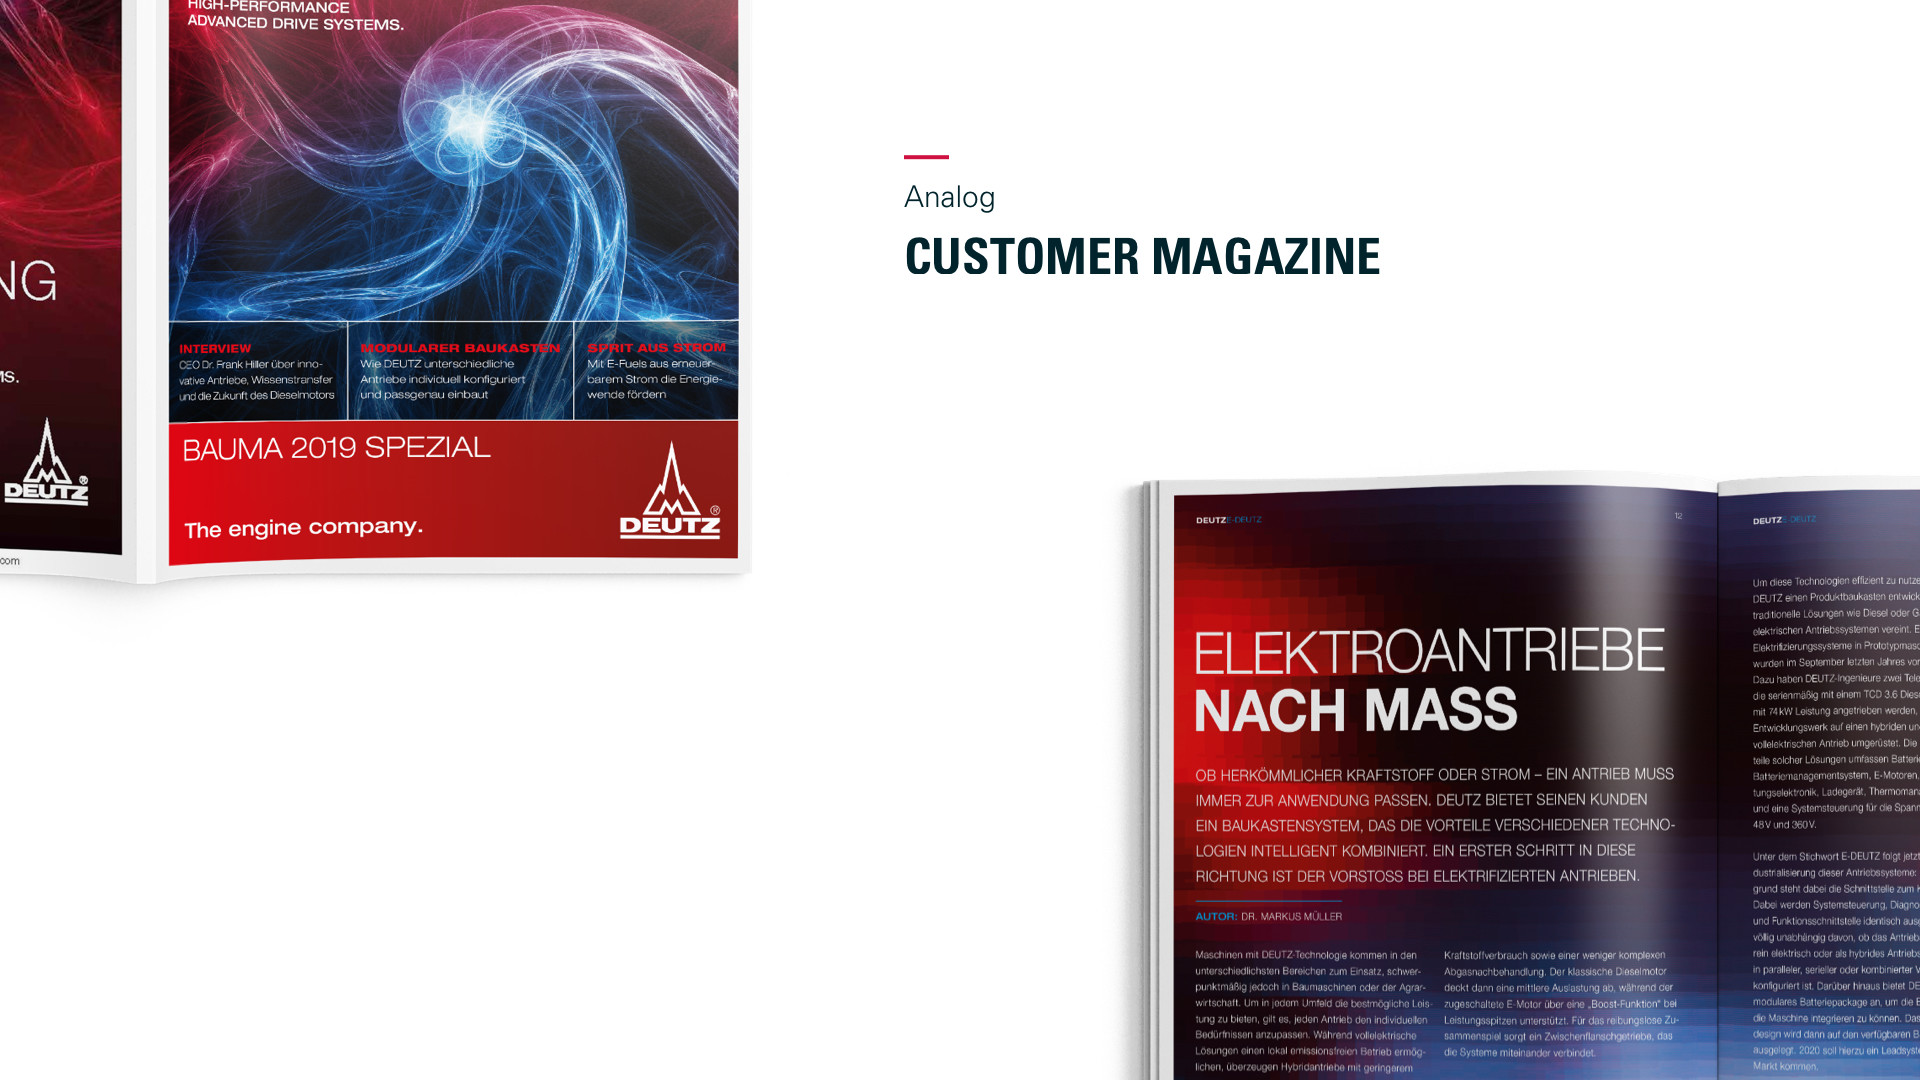 Deutz Customer Magazine 2